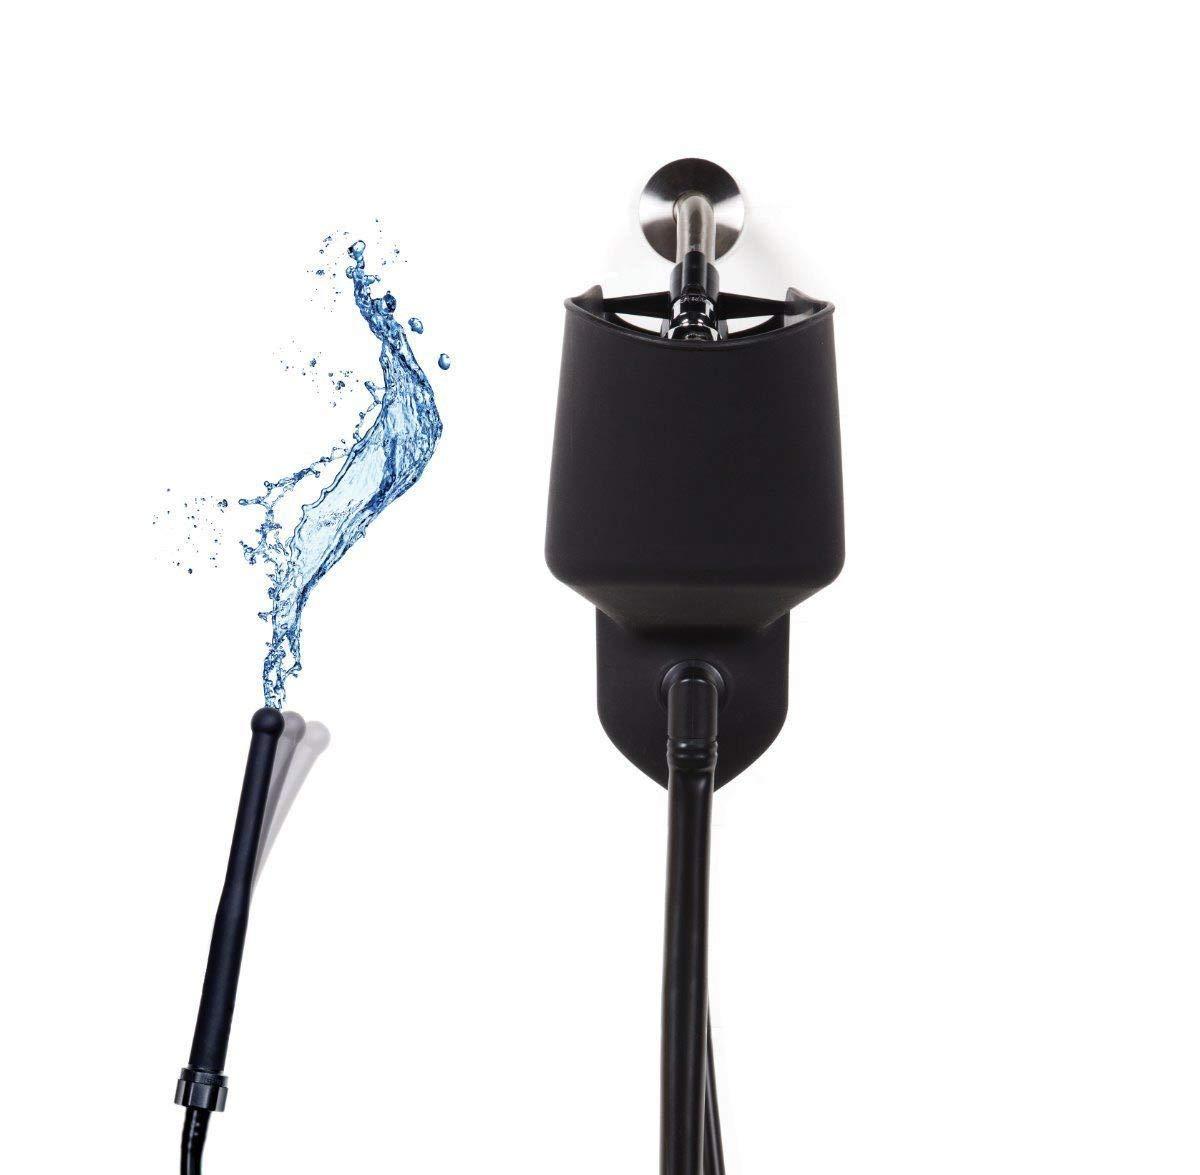 VOMY Pro Shower Travel Douche Enema Vaginal Cleansing System